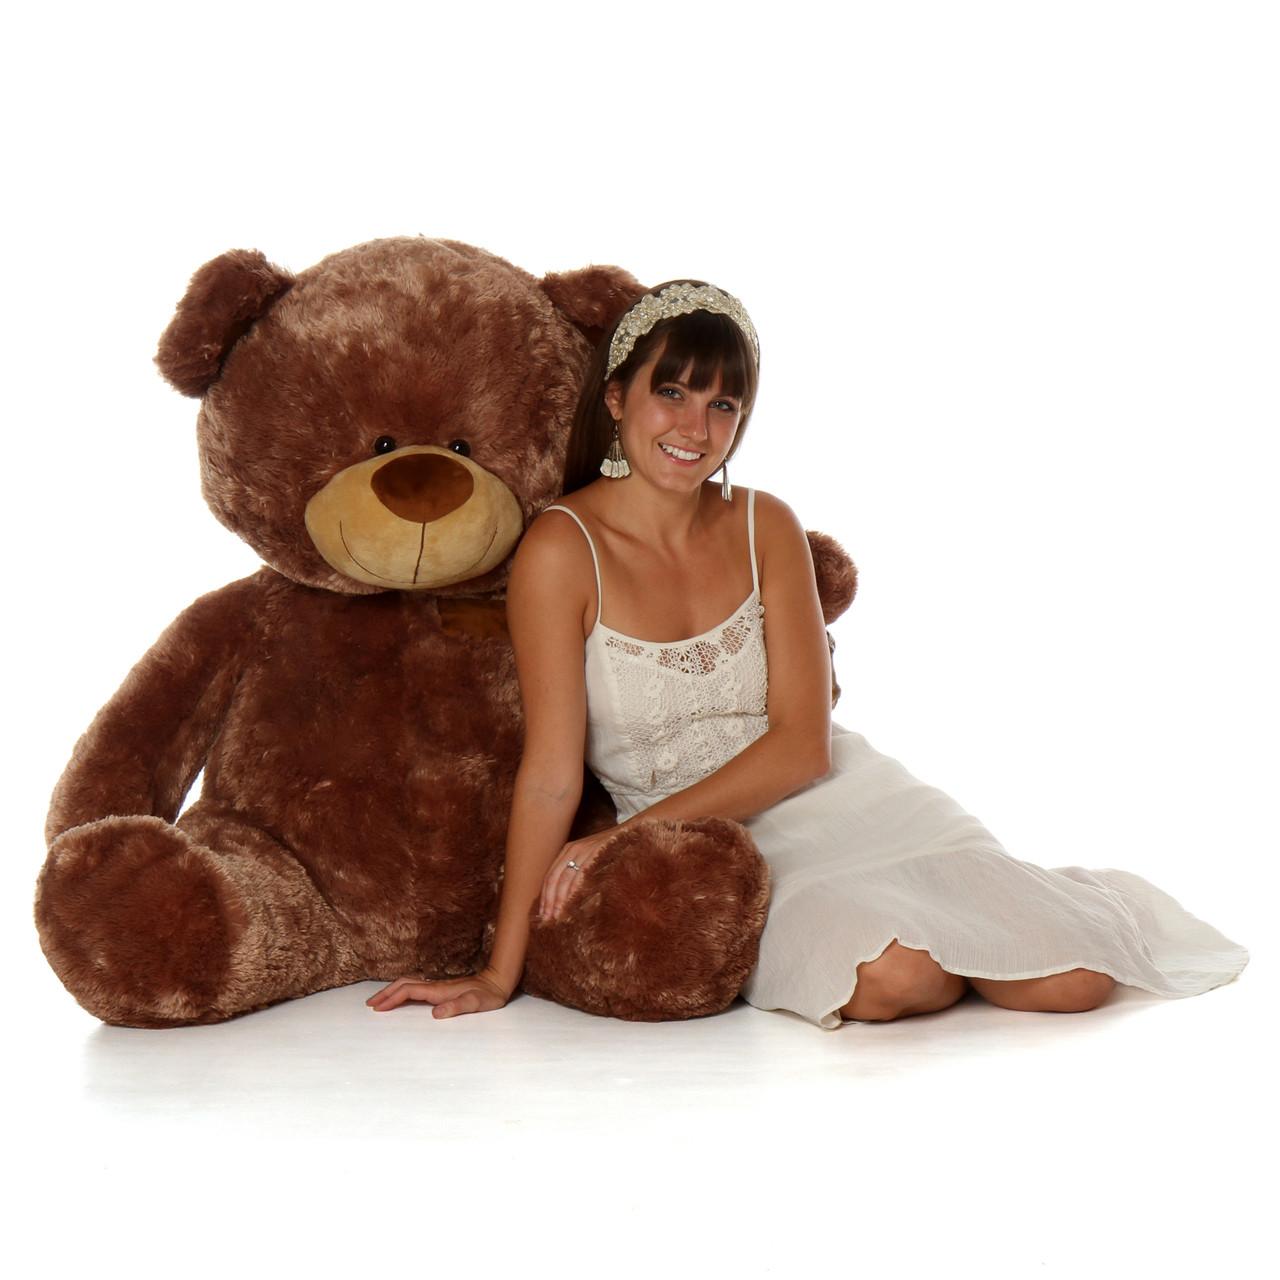 Tiny Shags 45 Mocha Brown Large Plush Teddy Bear Giant